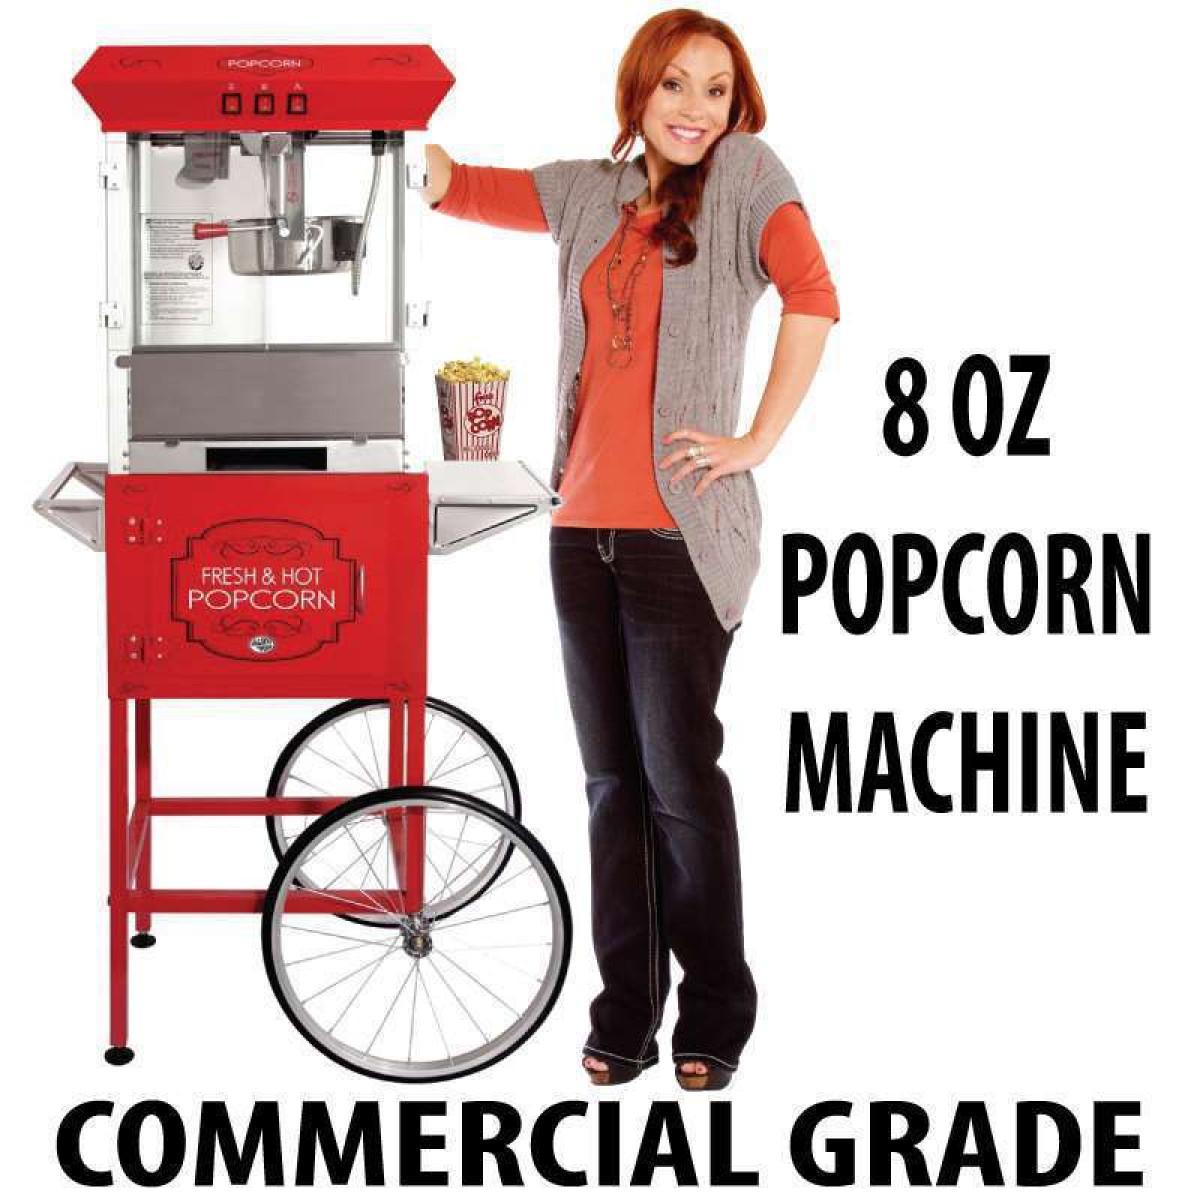 8 oz popcorn machine with cart